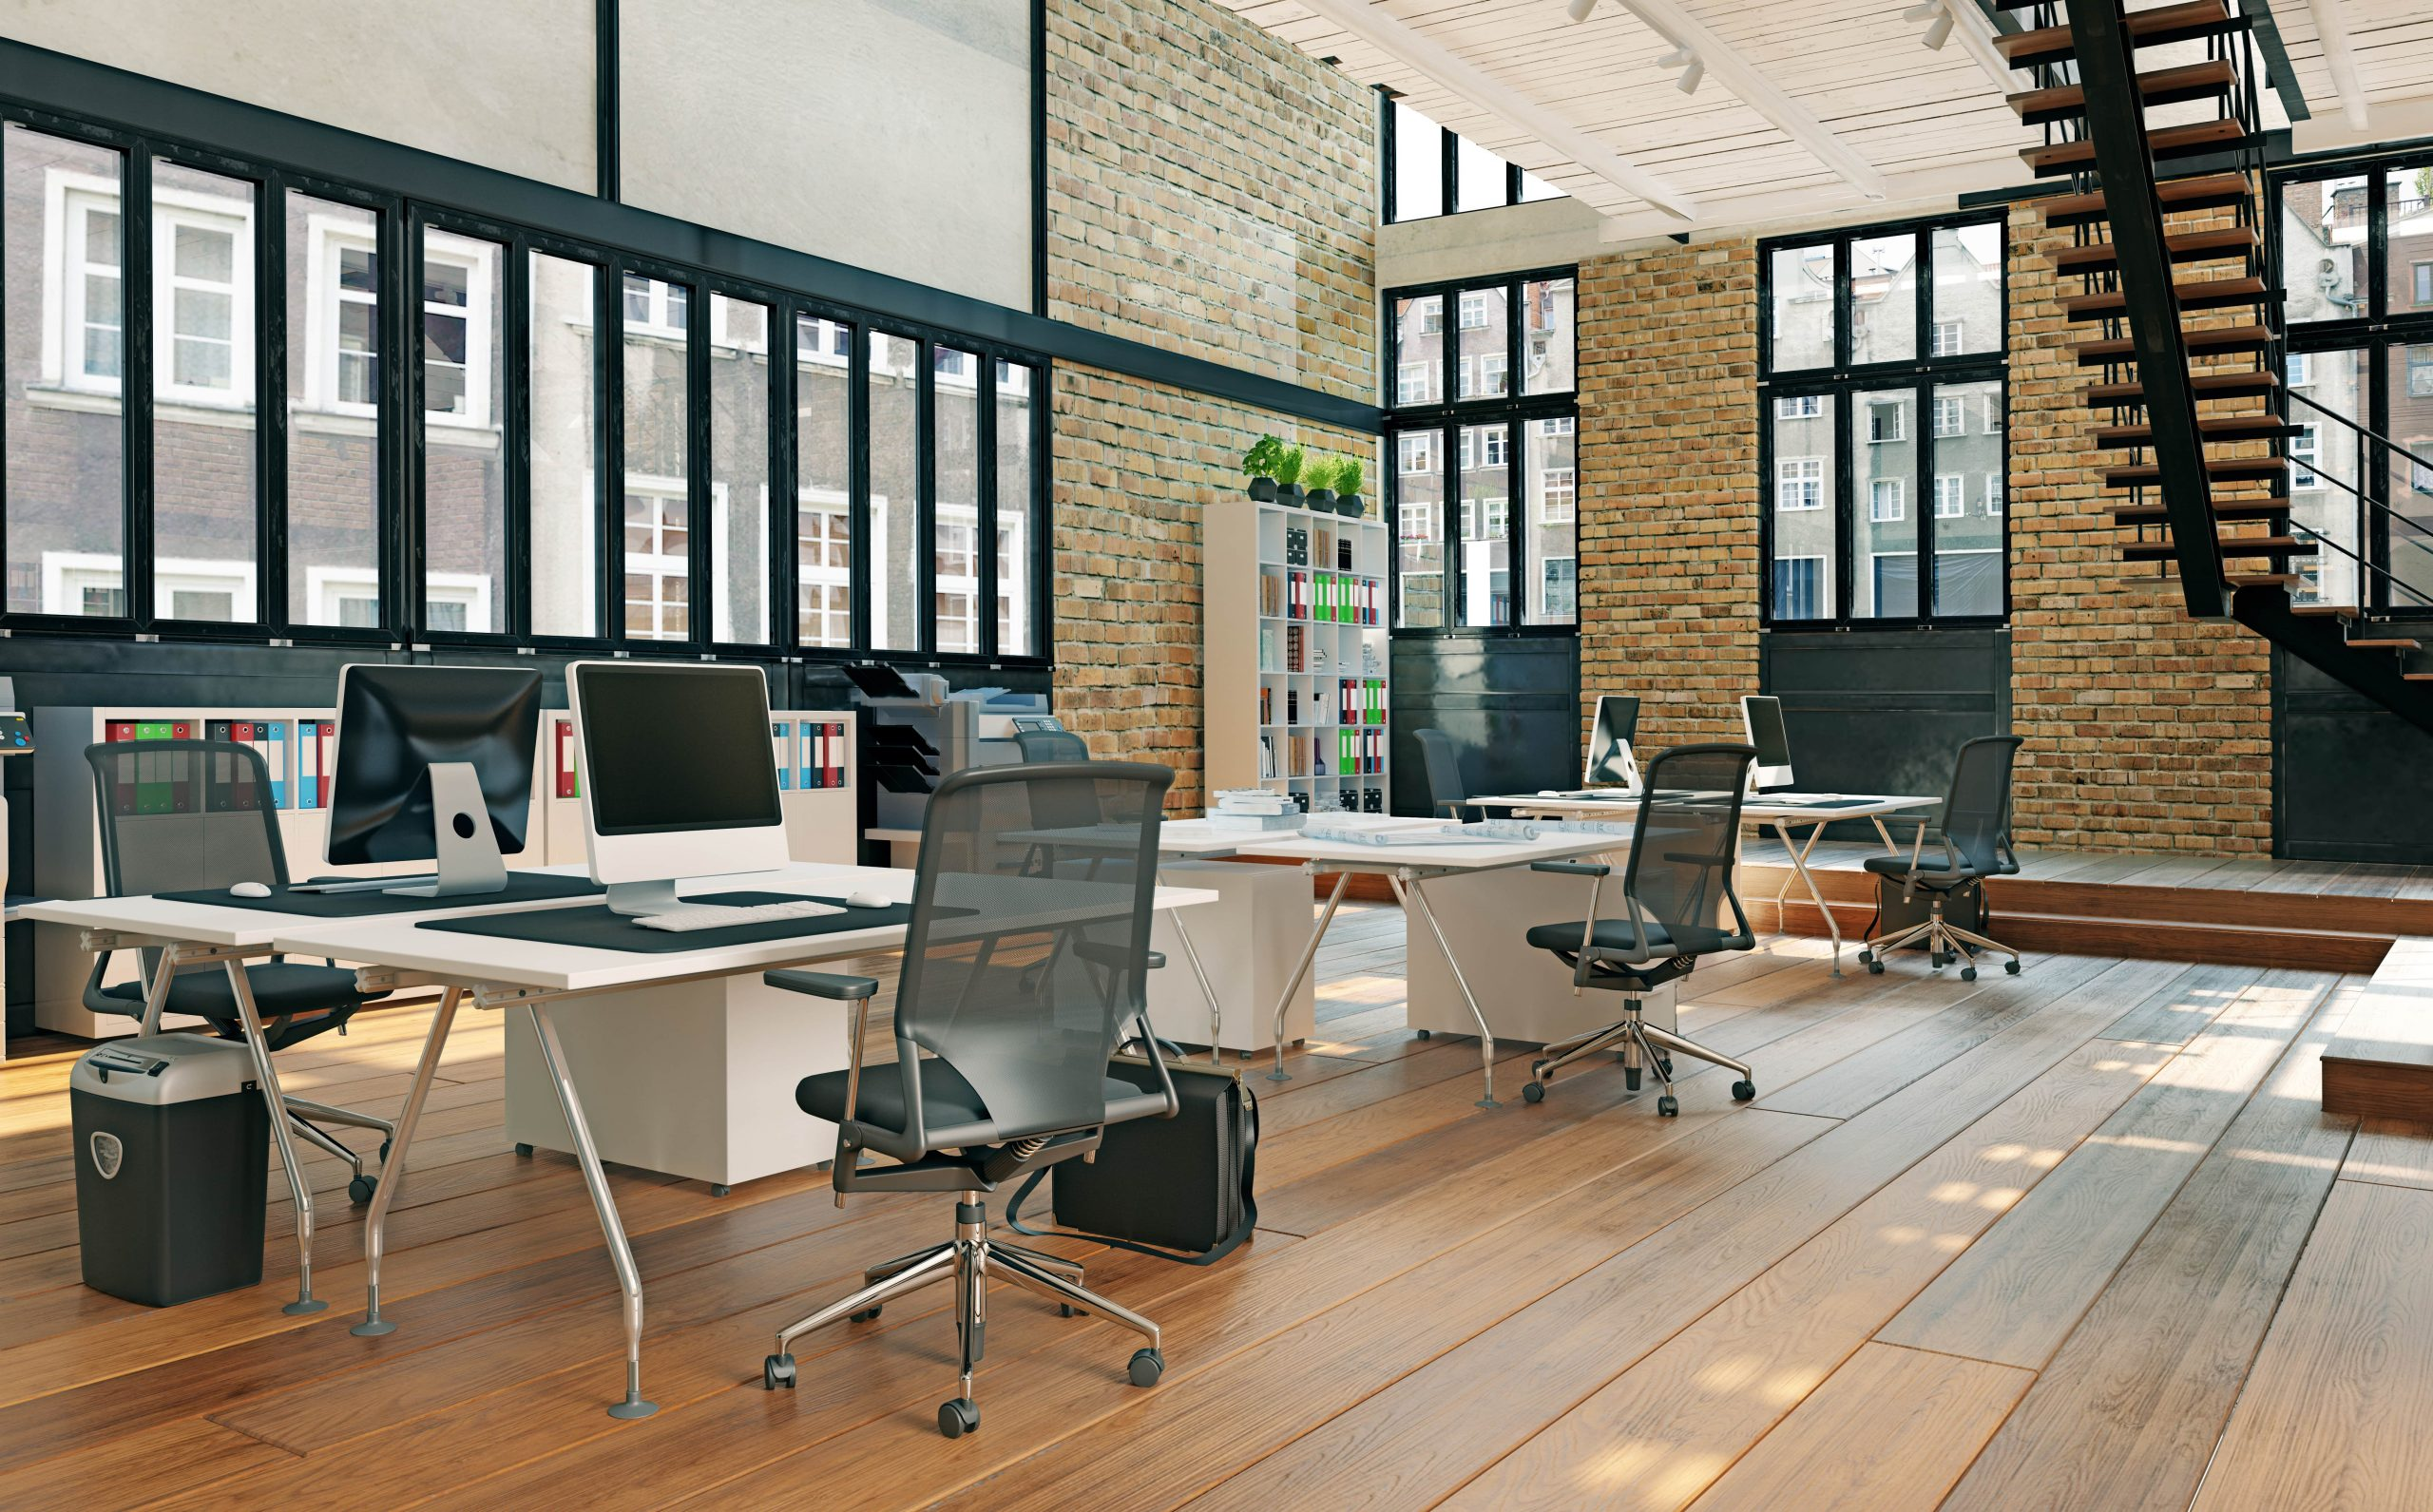 Integrating Wellness Architecture for Better living